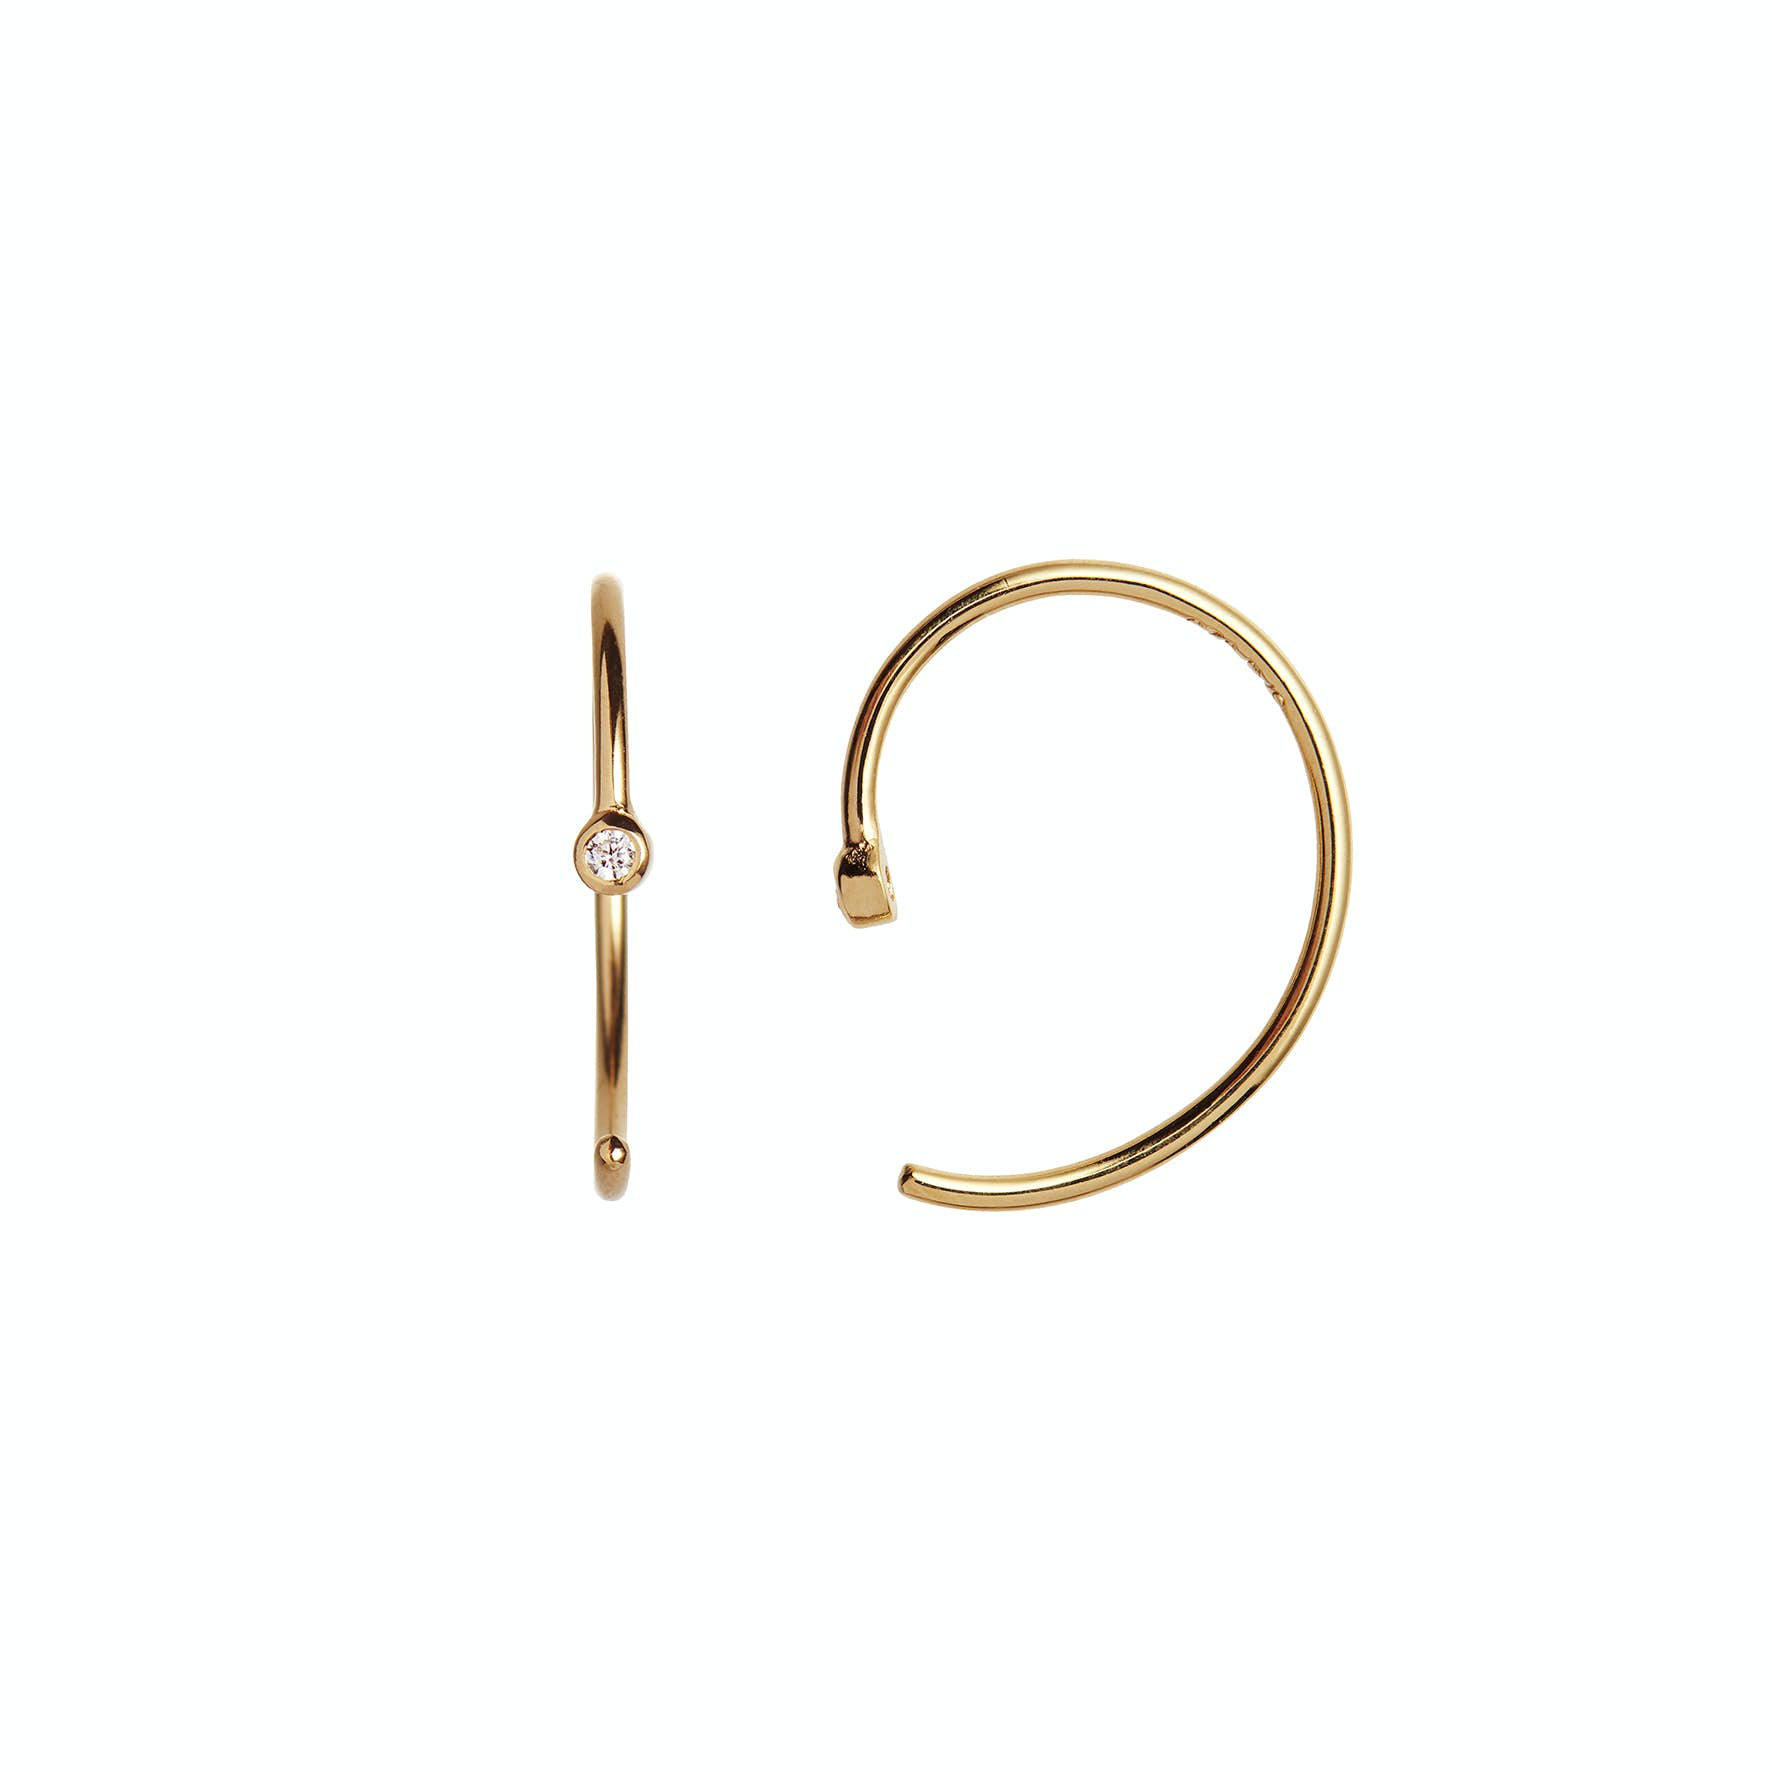 One Dot Open Creol fra STINE A Jewelry i Forgyldt-Sølv Sterling 925|Blank